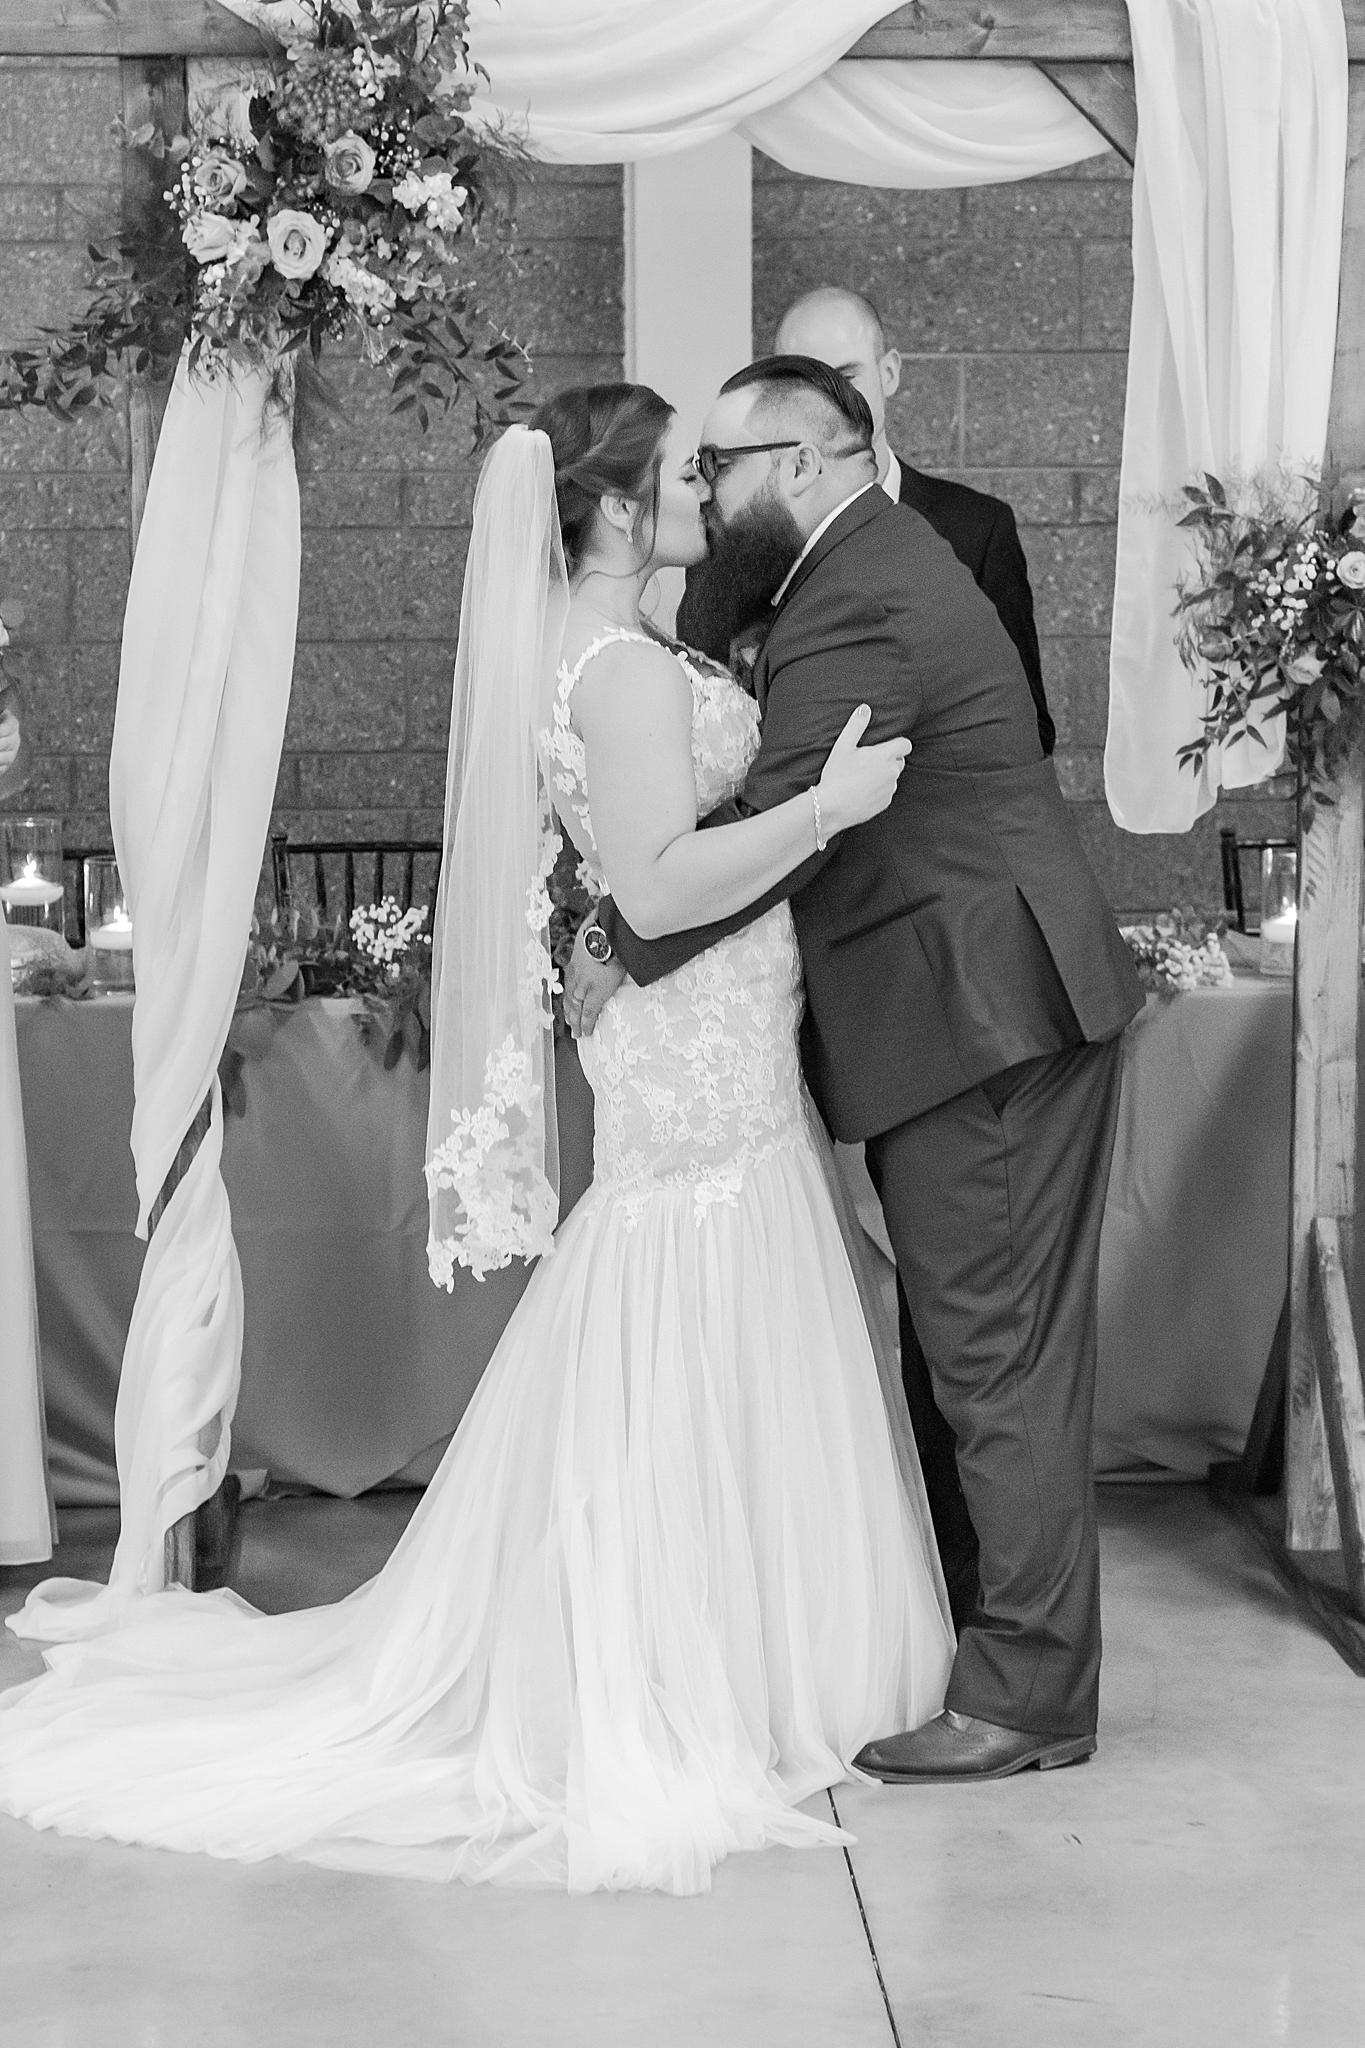 detroit-wedding-photographer-brownstown-event-center-wedding-photos-sam-josh-by-courtney-carolyn-photography_0040.jpg